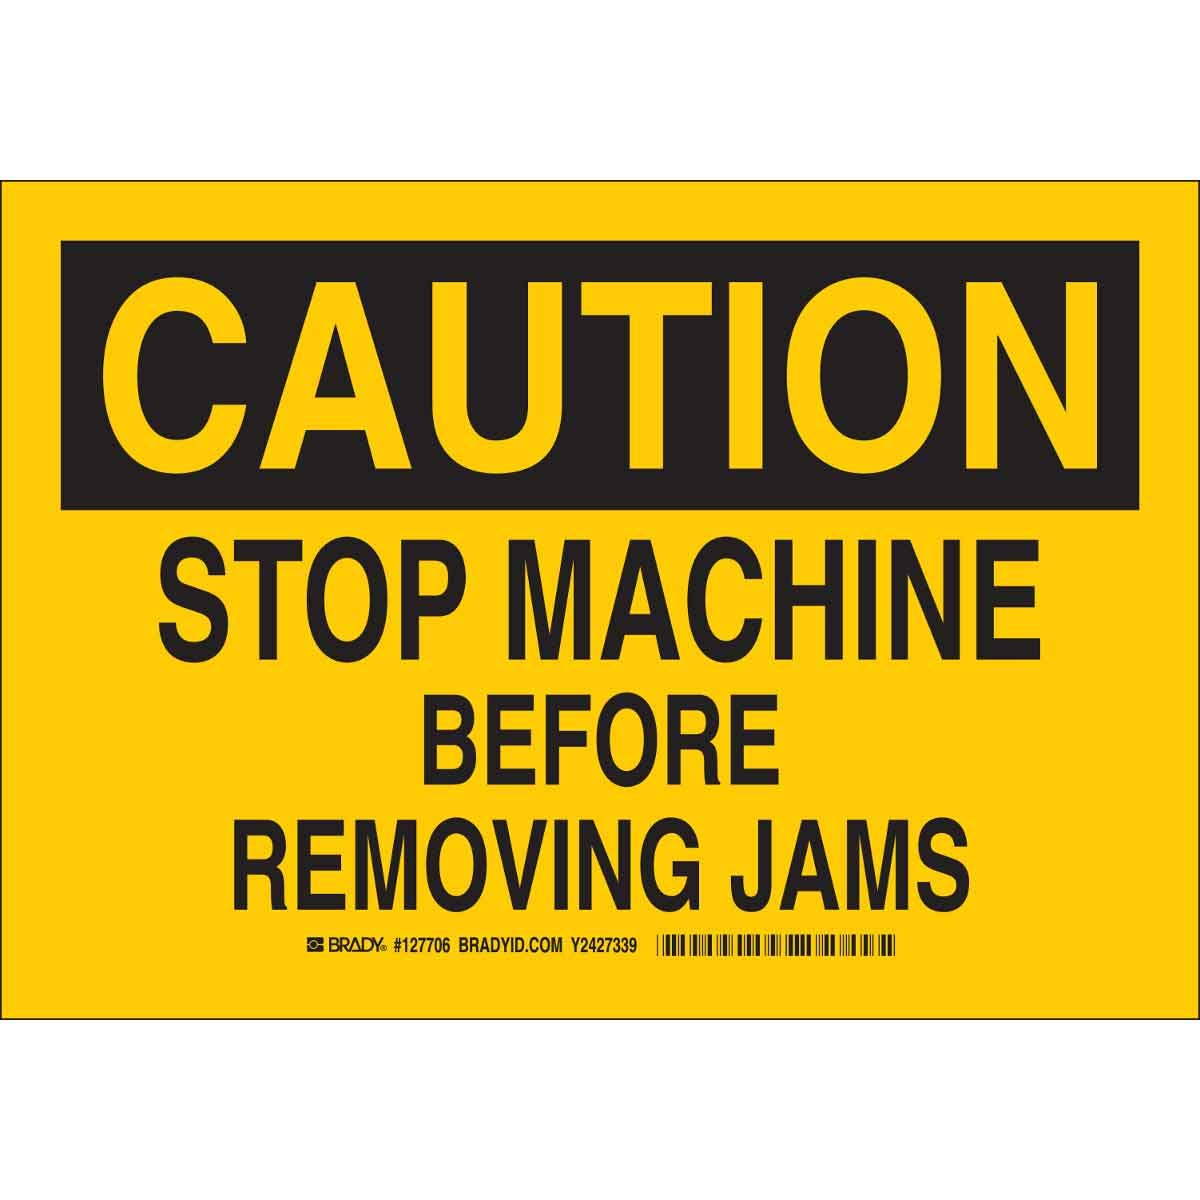 Brady 127706 Machine and Operational Sign, Legend